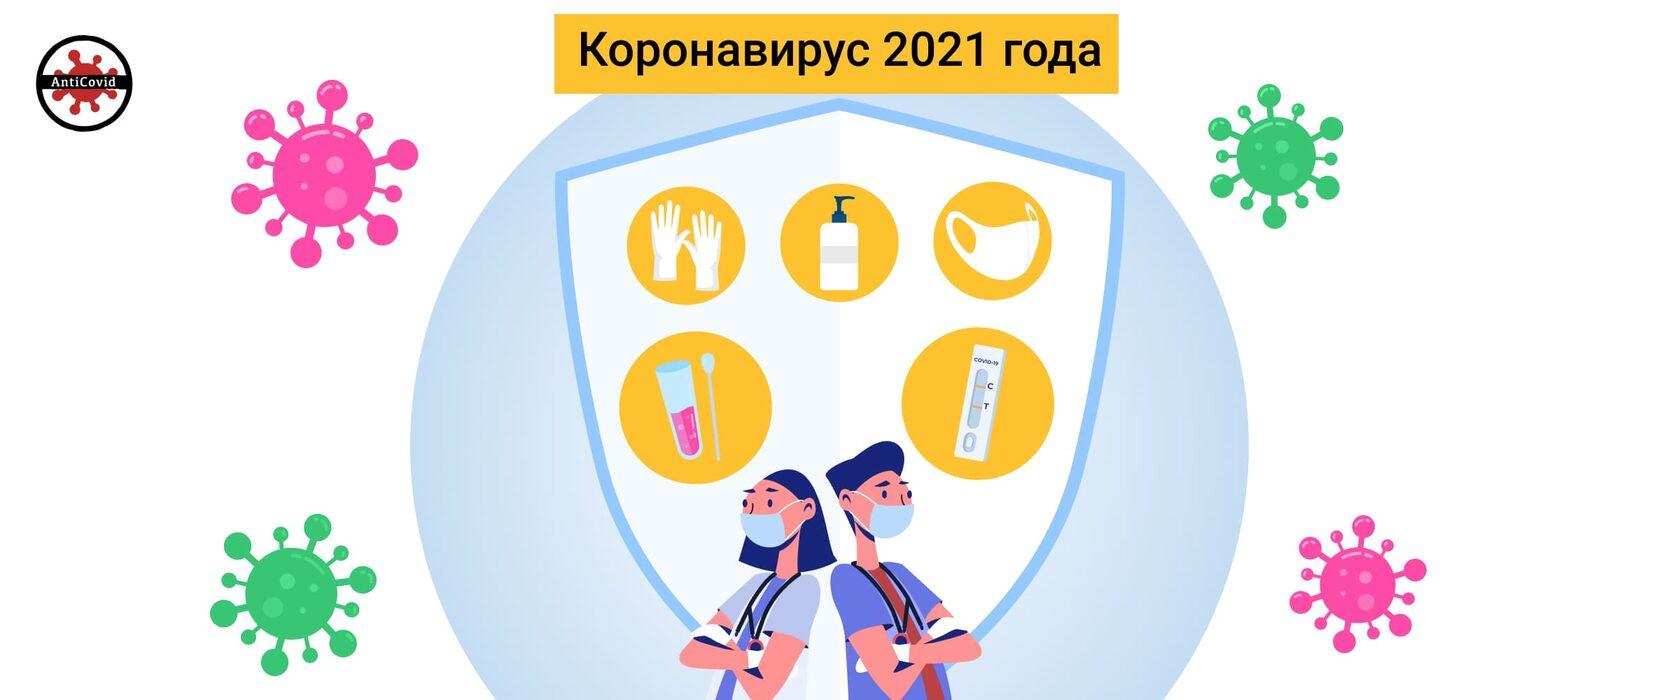 Коронавирус 2021 года